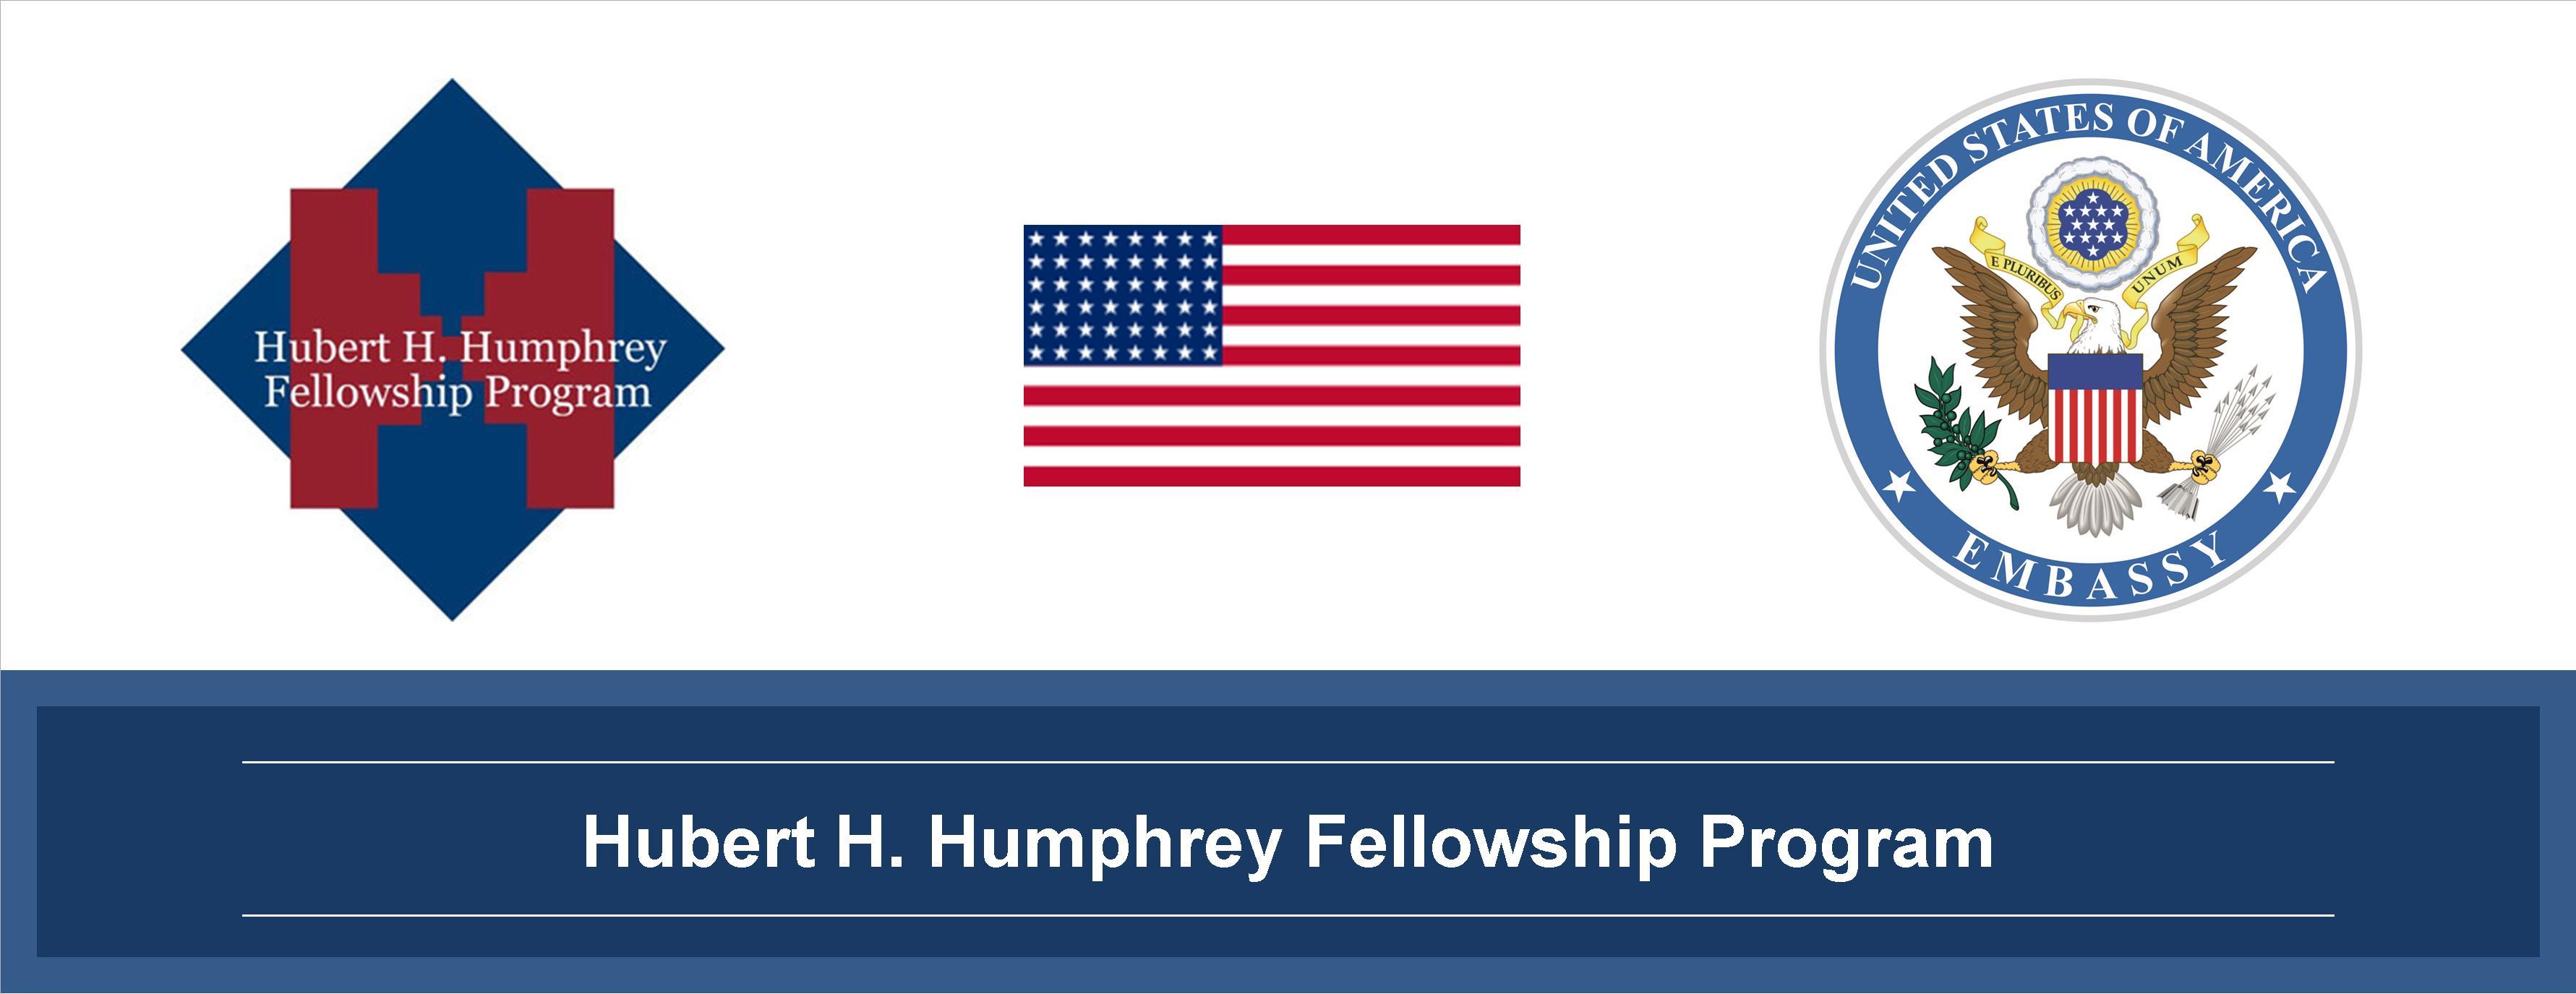 Hubert H. Humphrey Fellowship Program logo